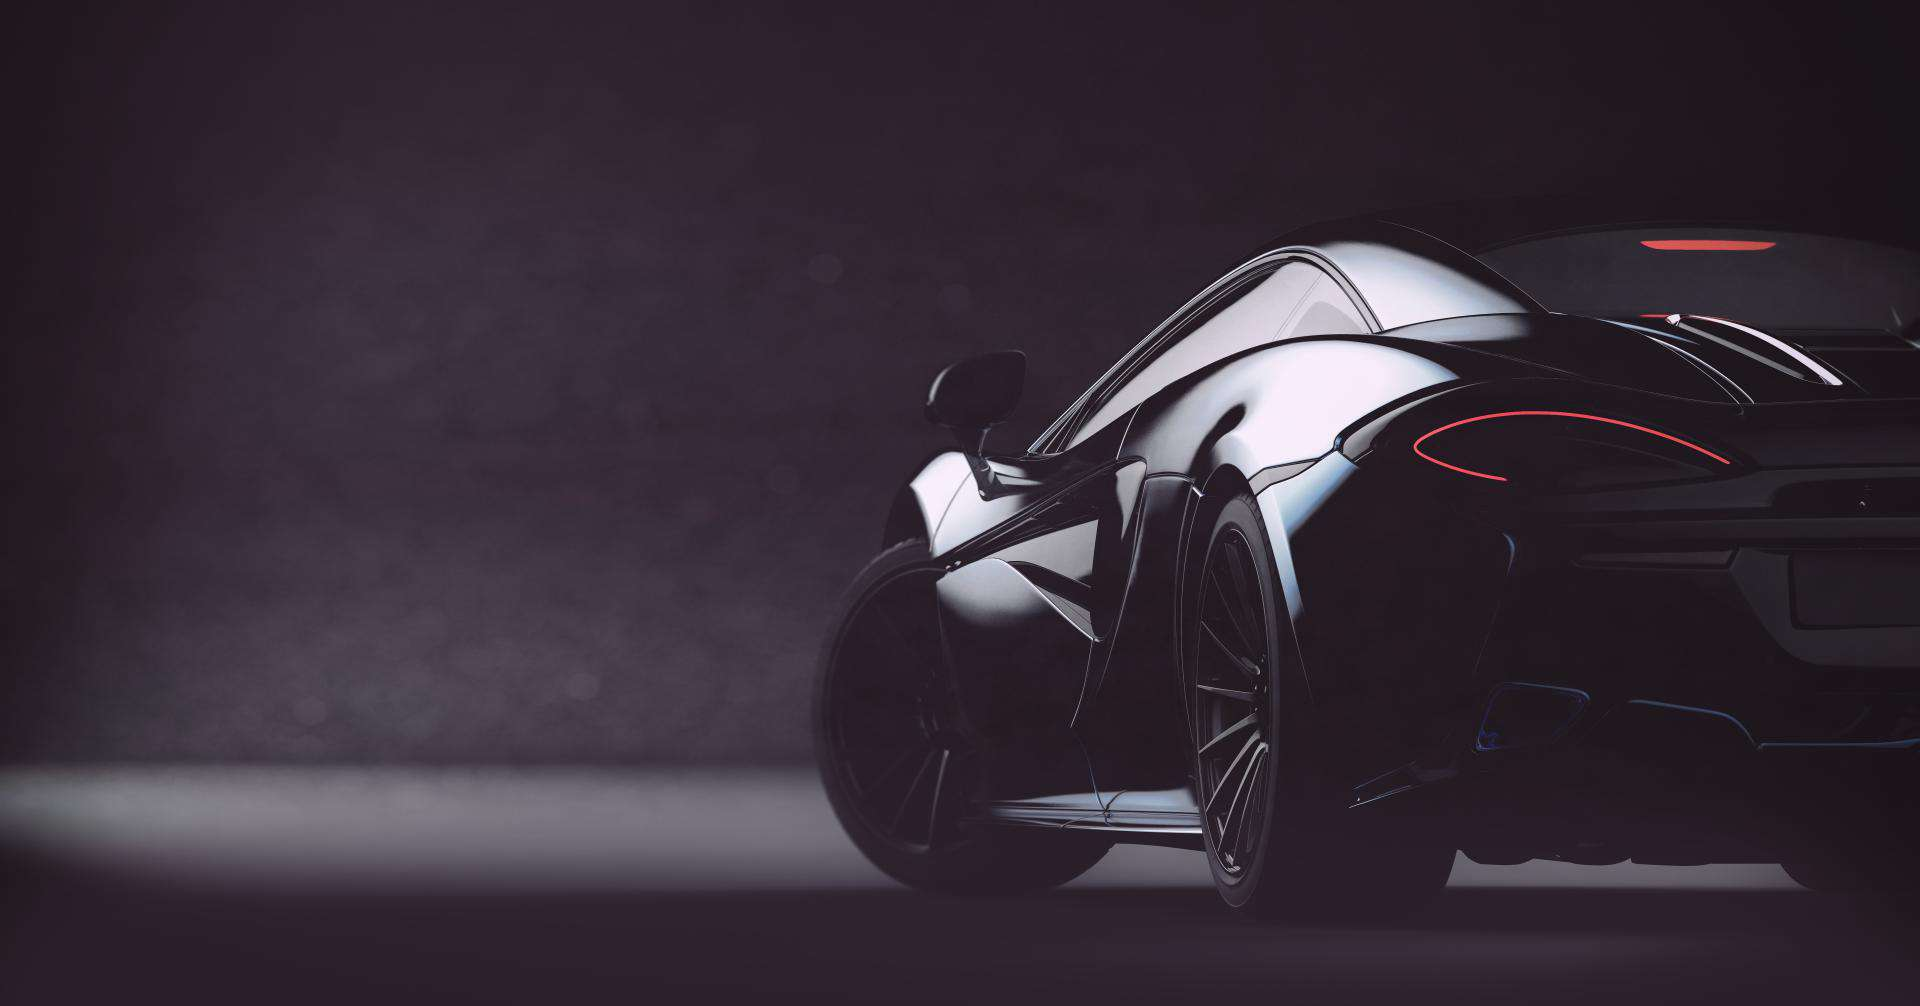 Renault und Nissan sollen Elektro-Limousinen als Konkurrenten zu Teslas Model 3 planen